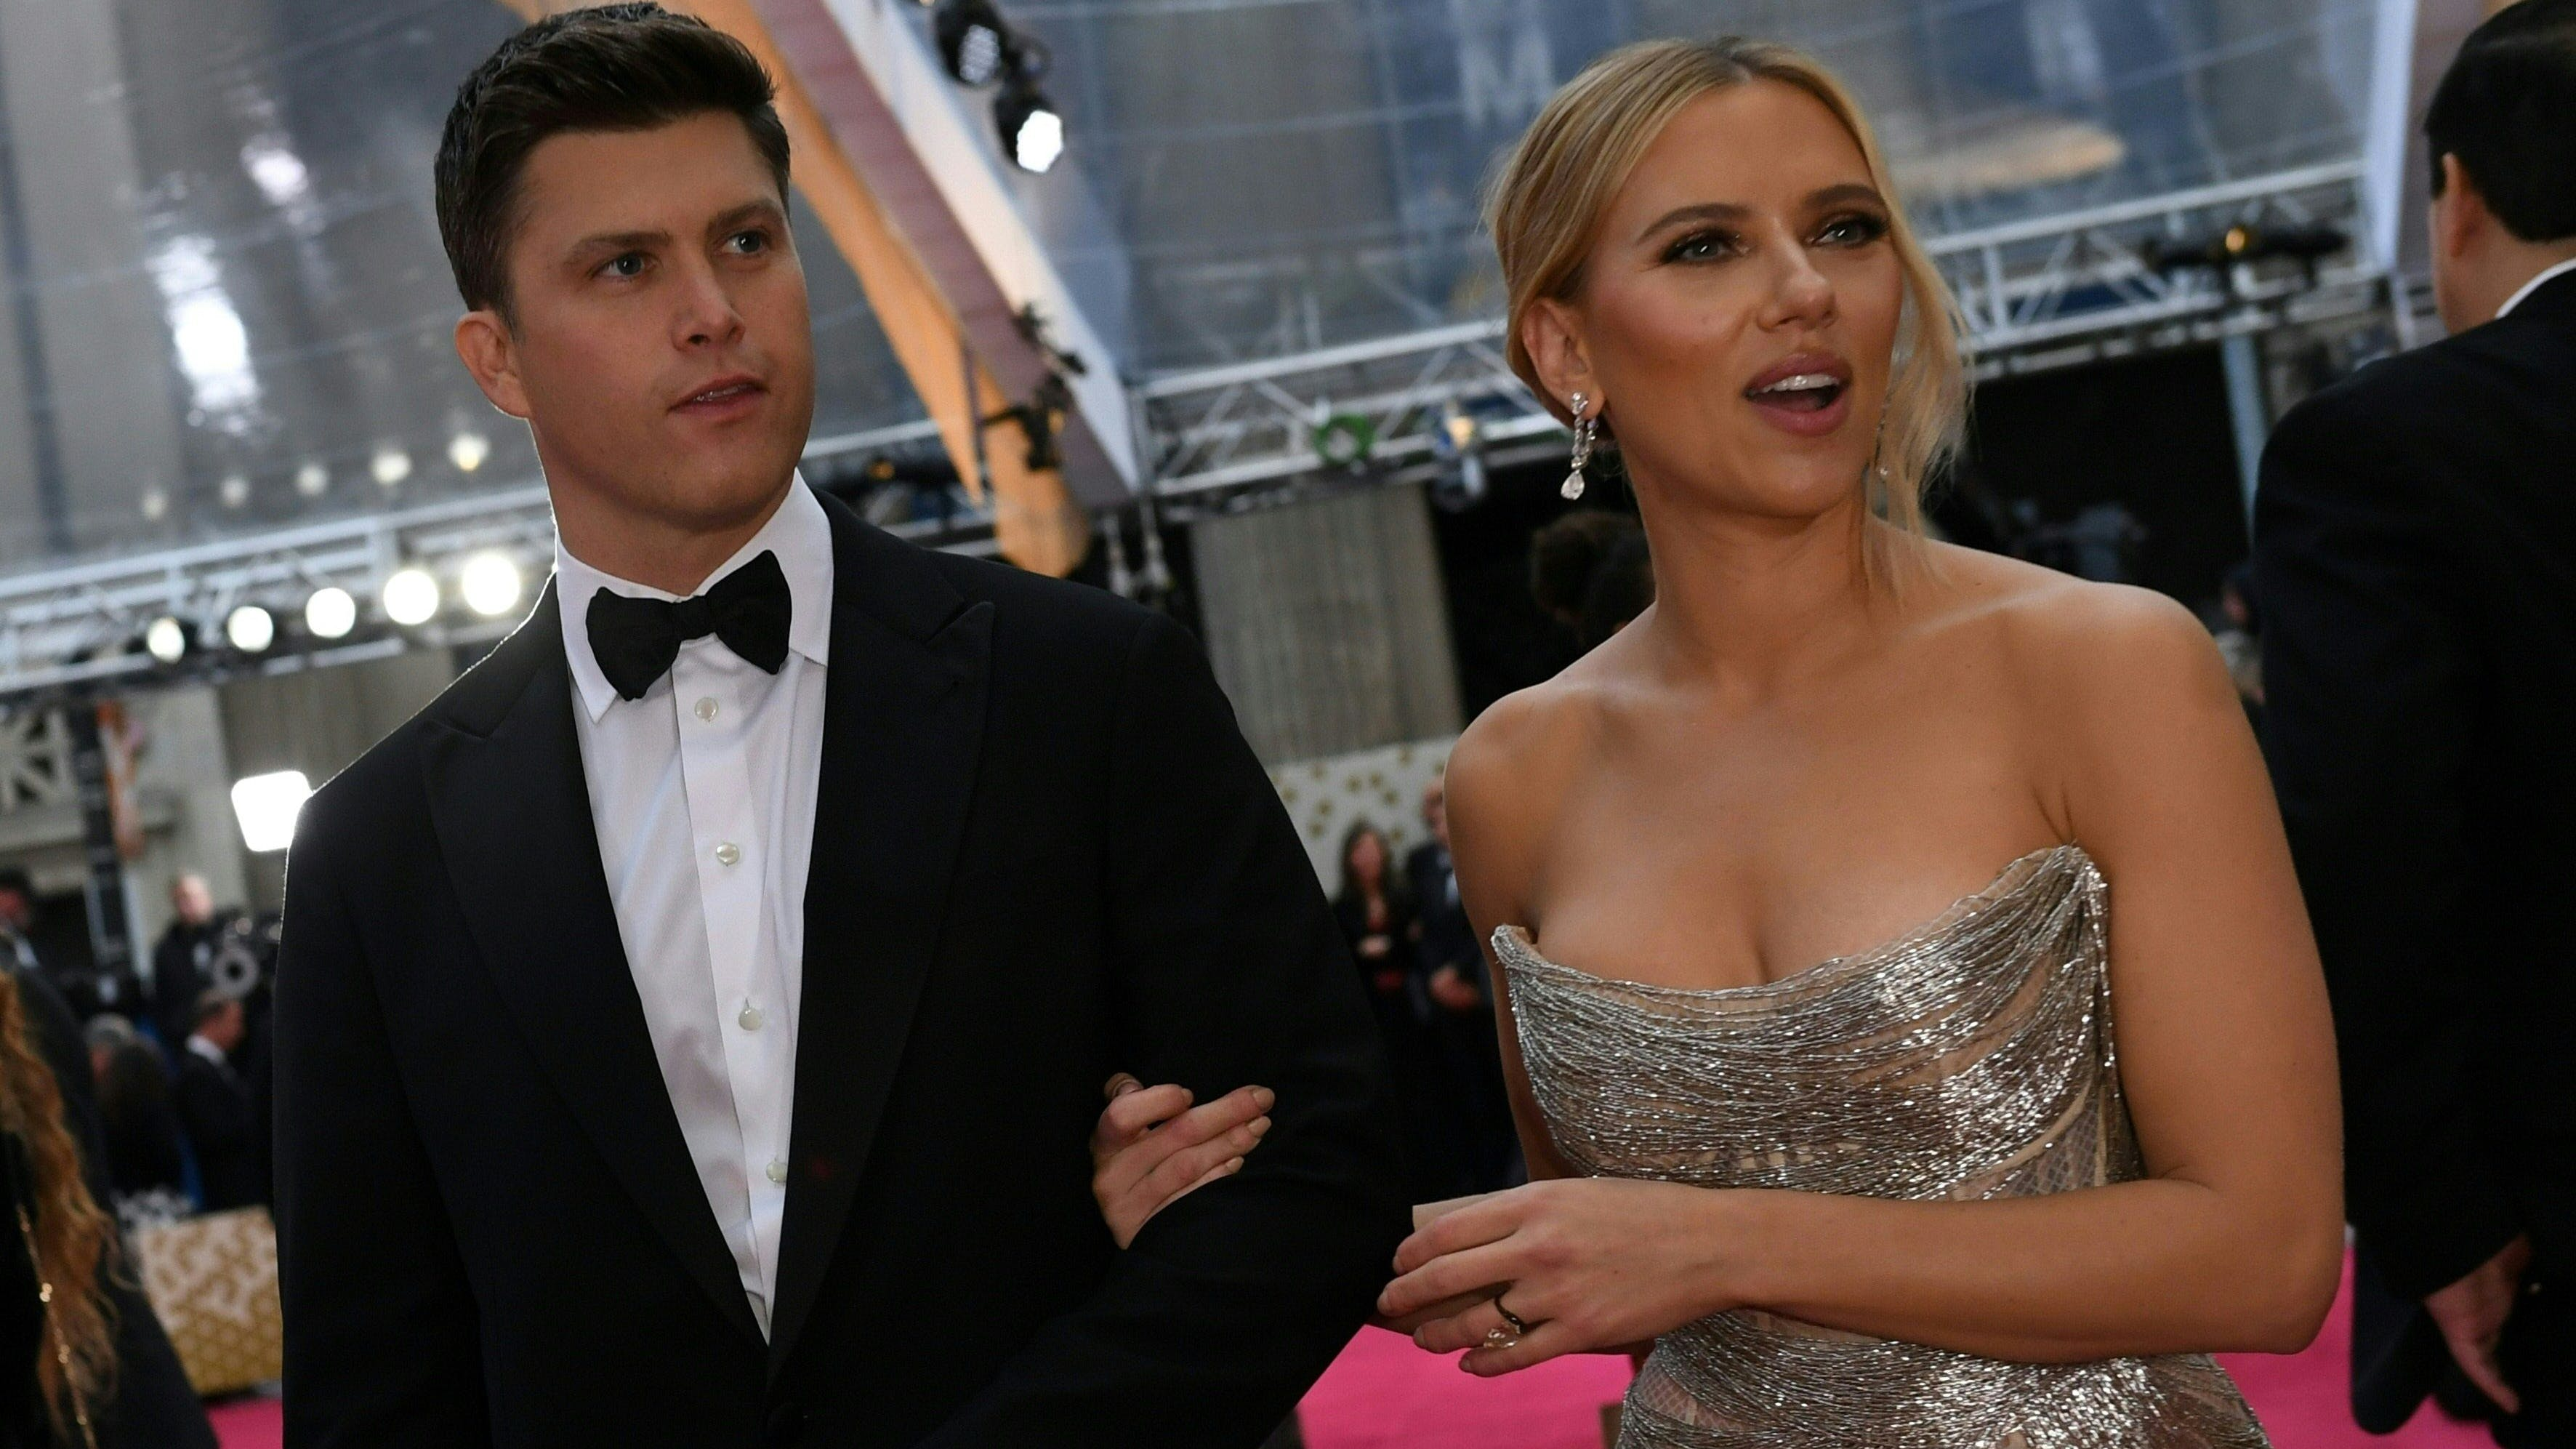 Scarlett Johansson mit ihrem Mann, dem Comedian Colin Jost an der Oscar-Verleihung im Februar 2020.